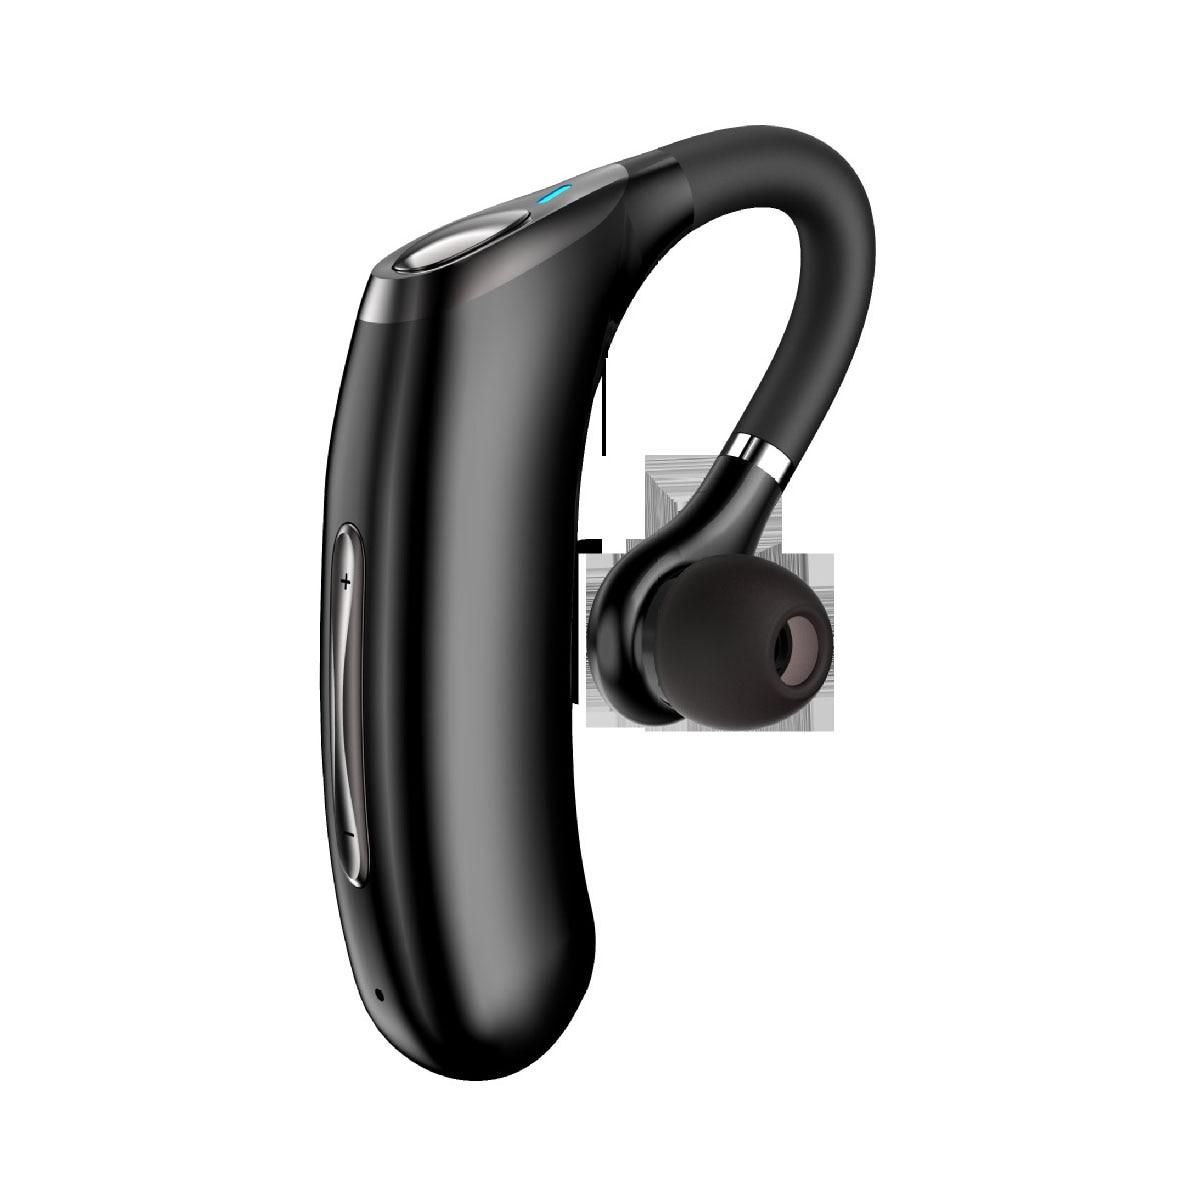 Bluetooth Headset Extra Long Hanging Single Ear Bluetooth Headset Quick Charging Waterproof Private Model Phone Earphones Headphones Aliexpress